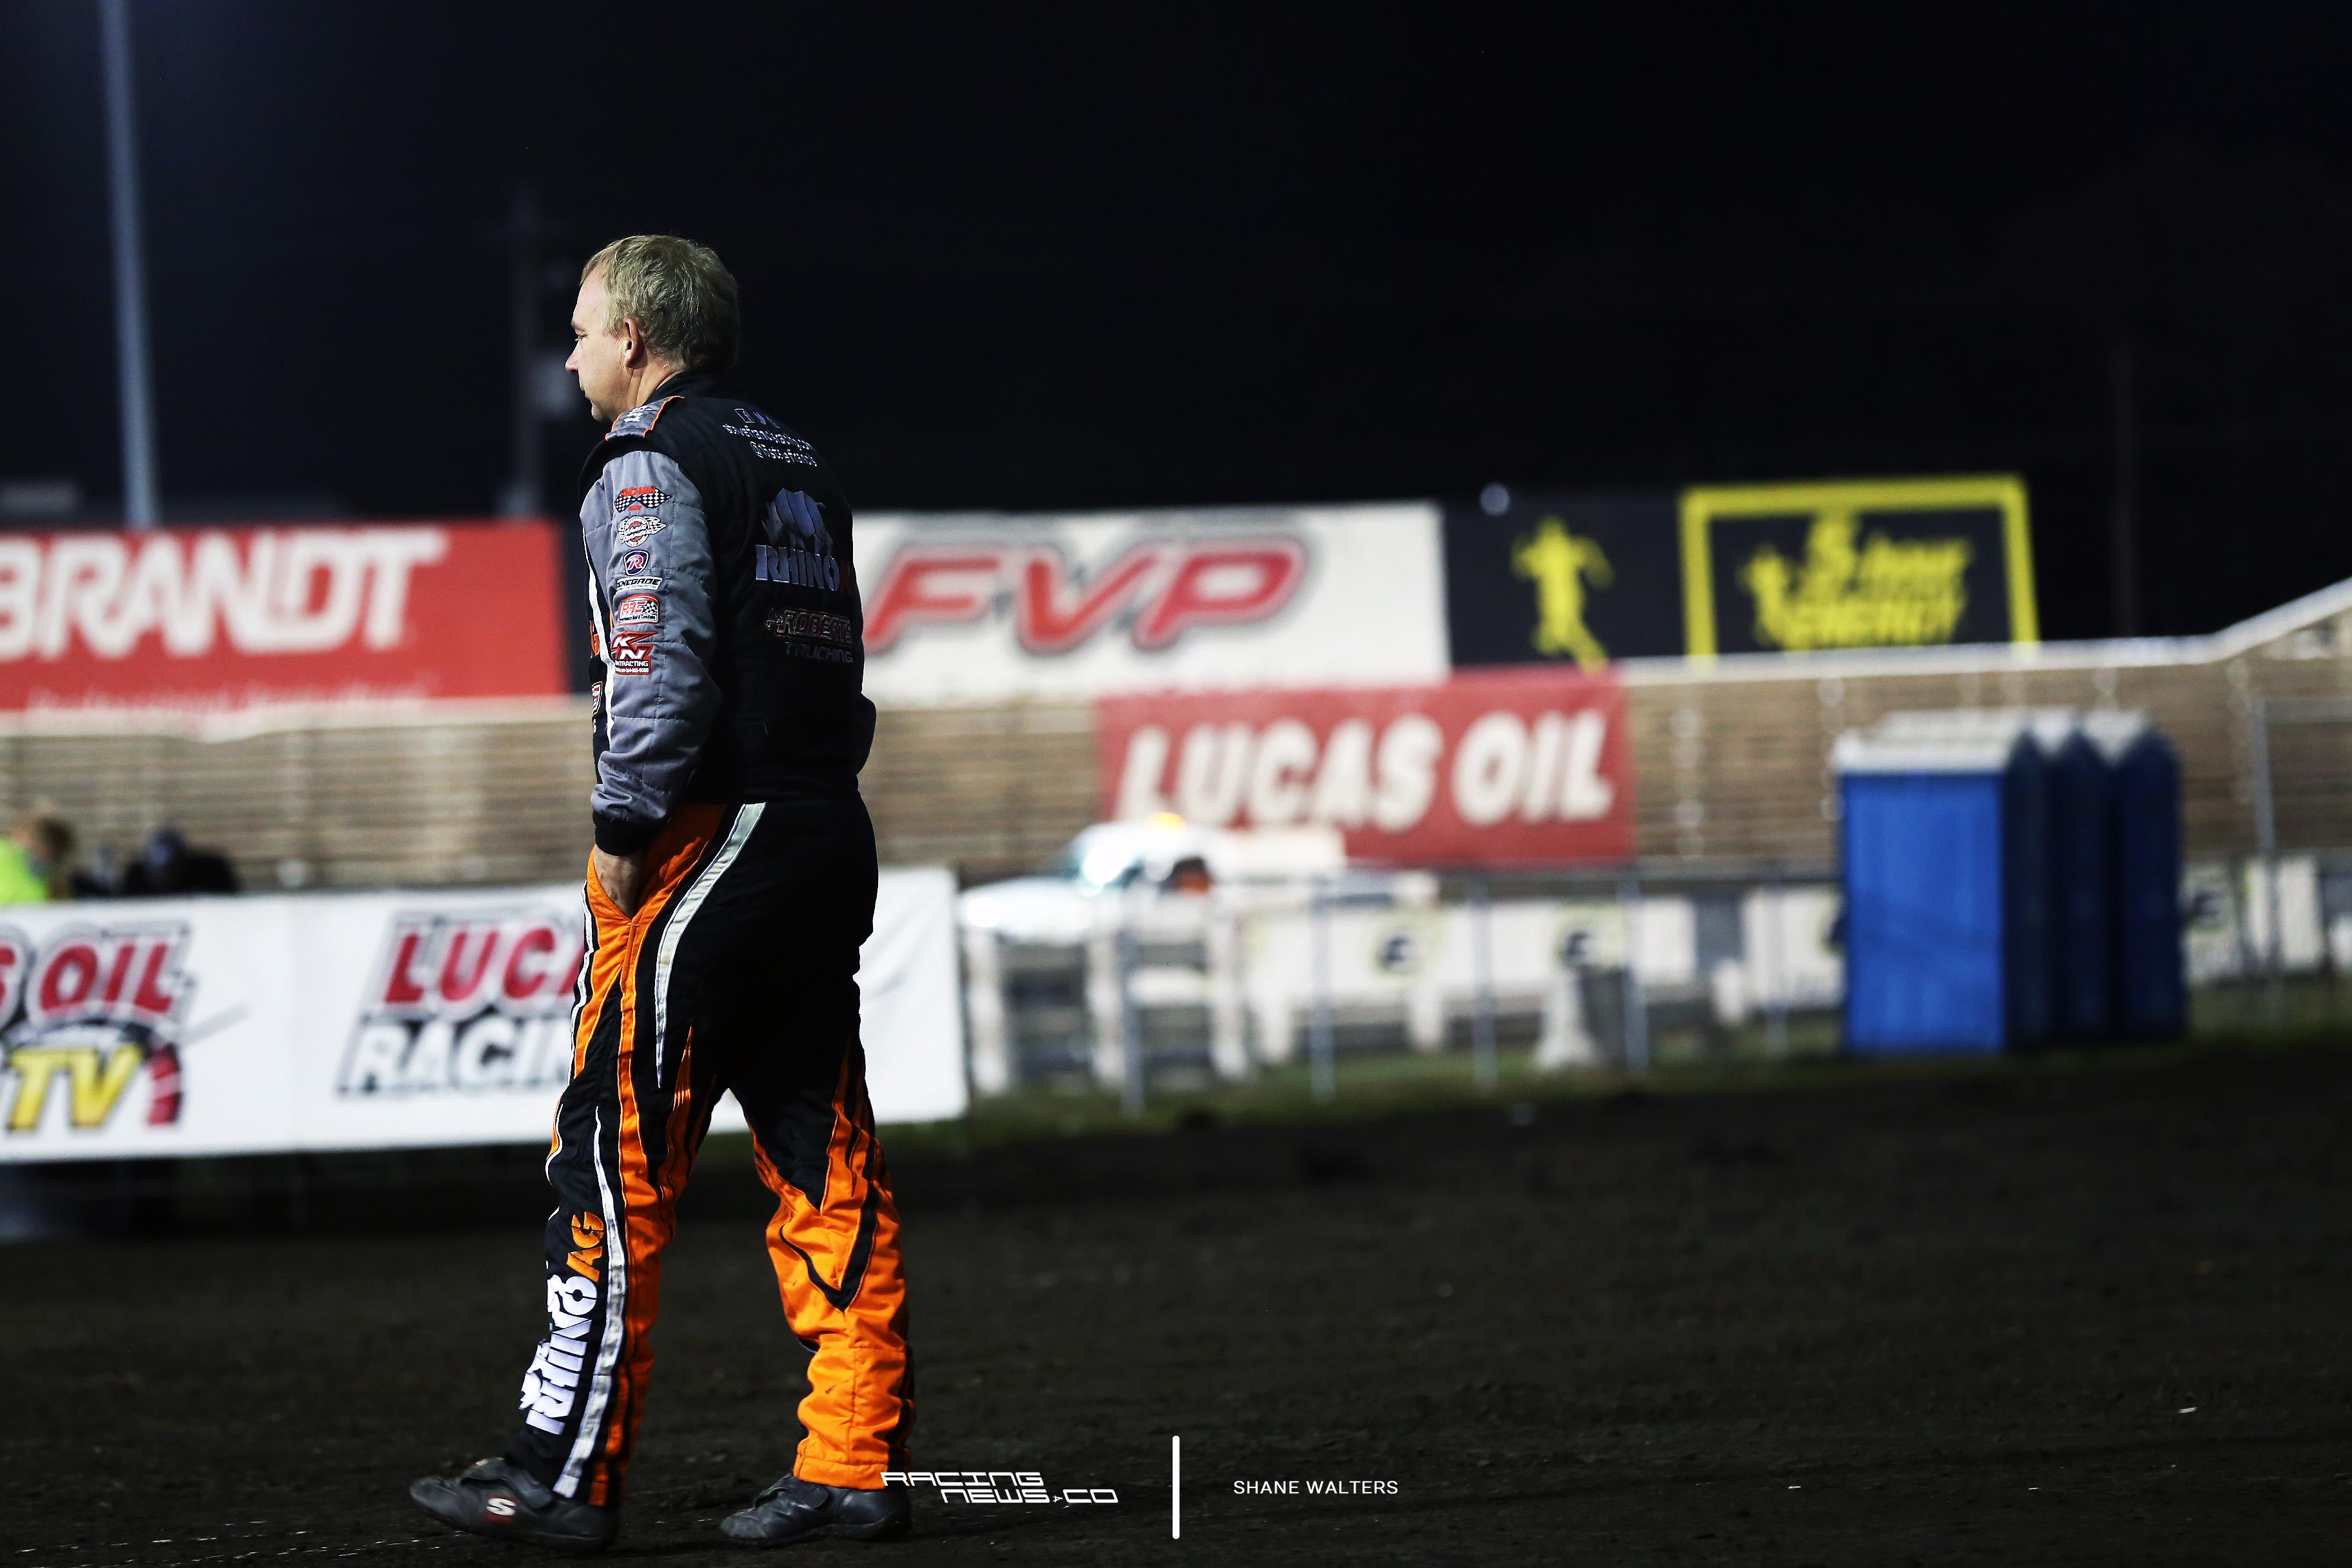 Steve Francis Racing Driver 7149